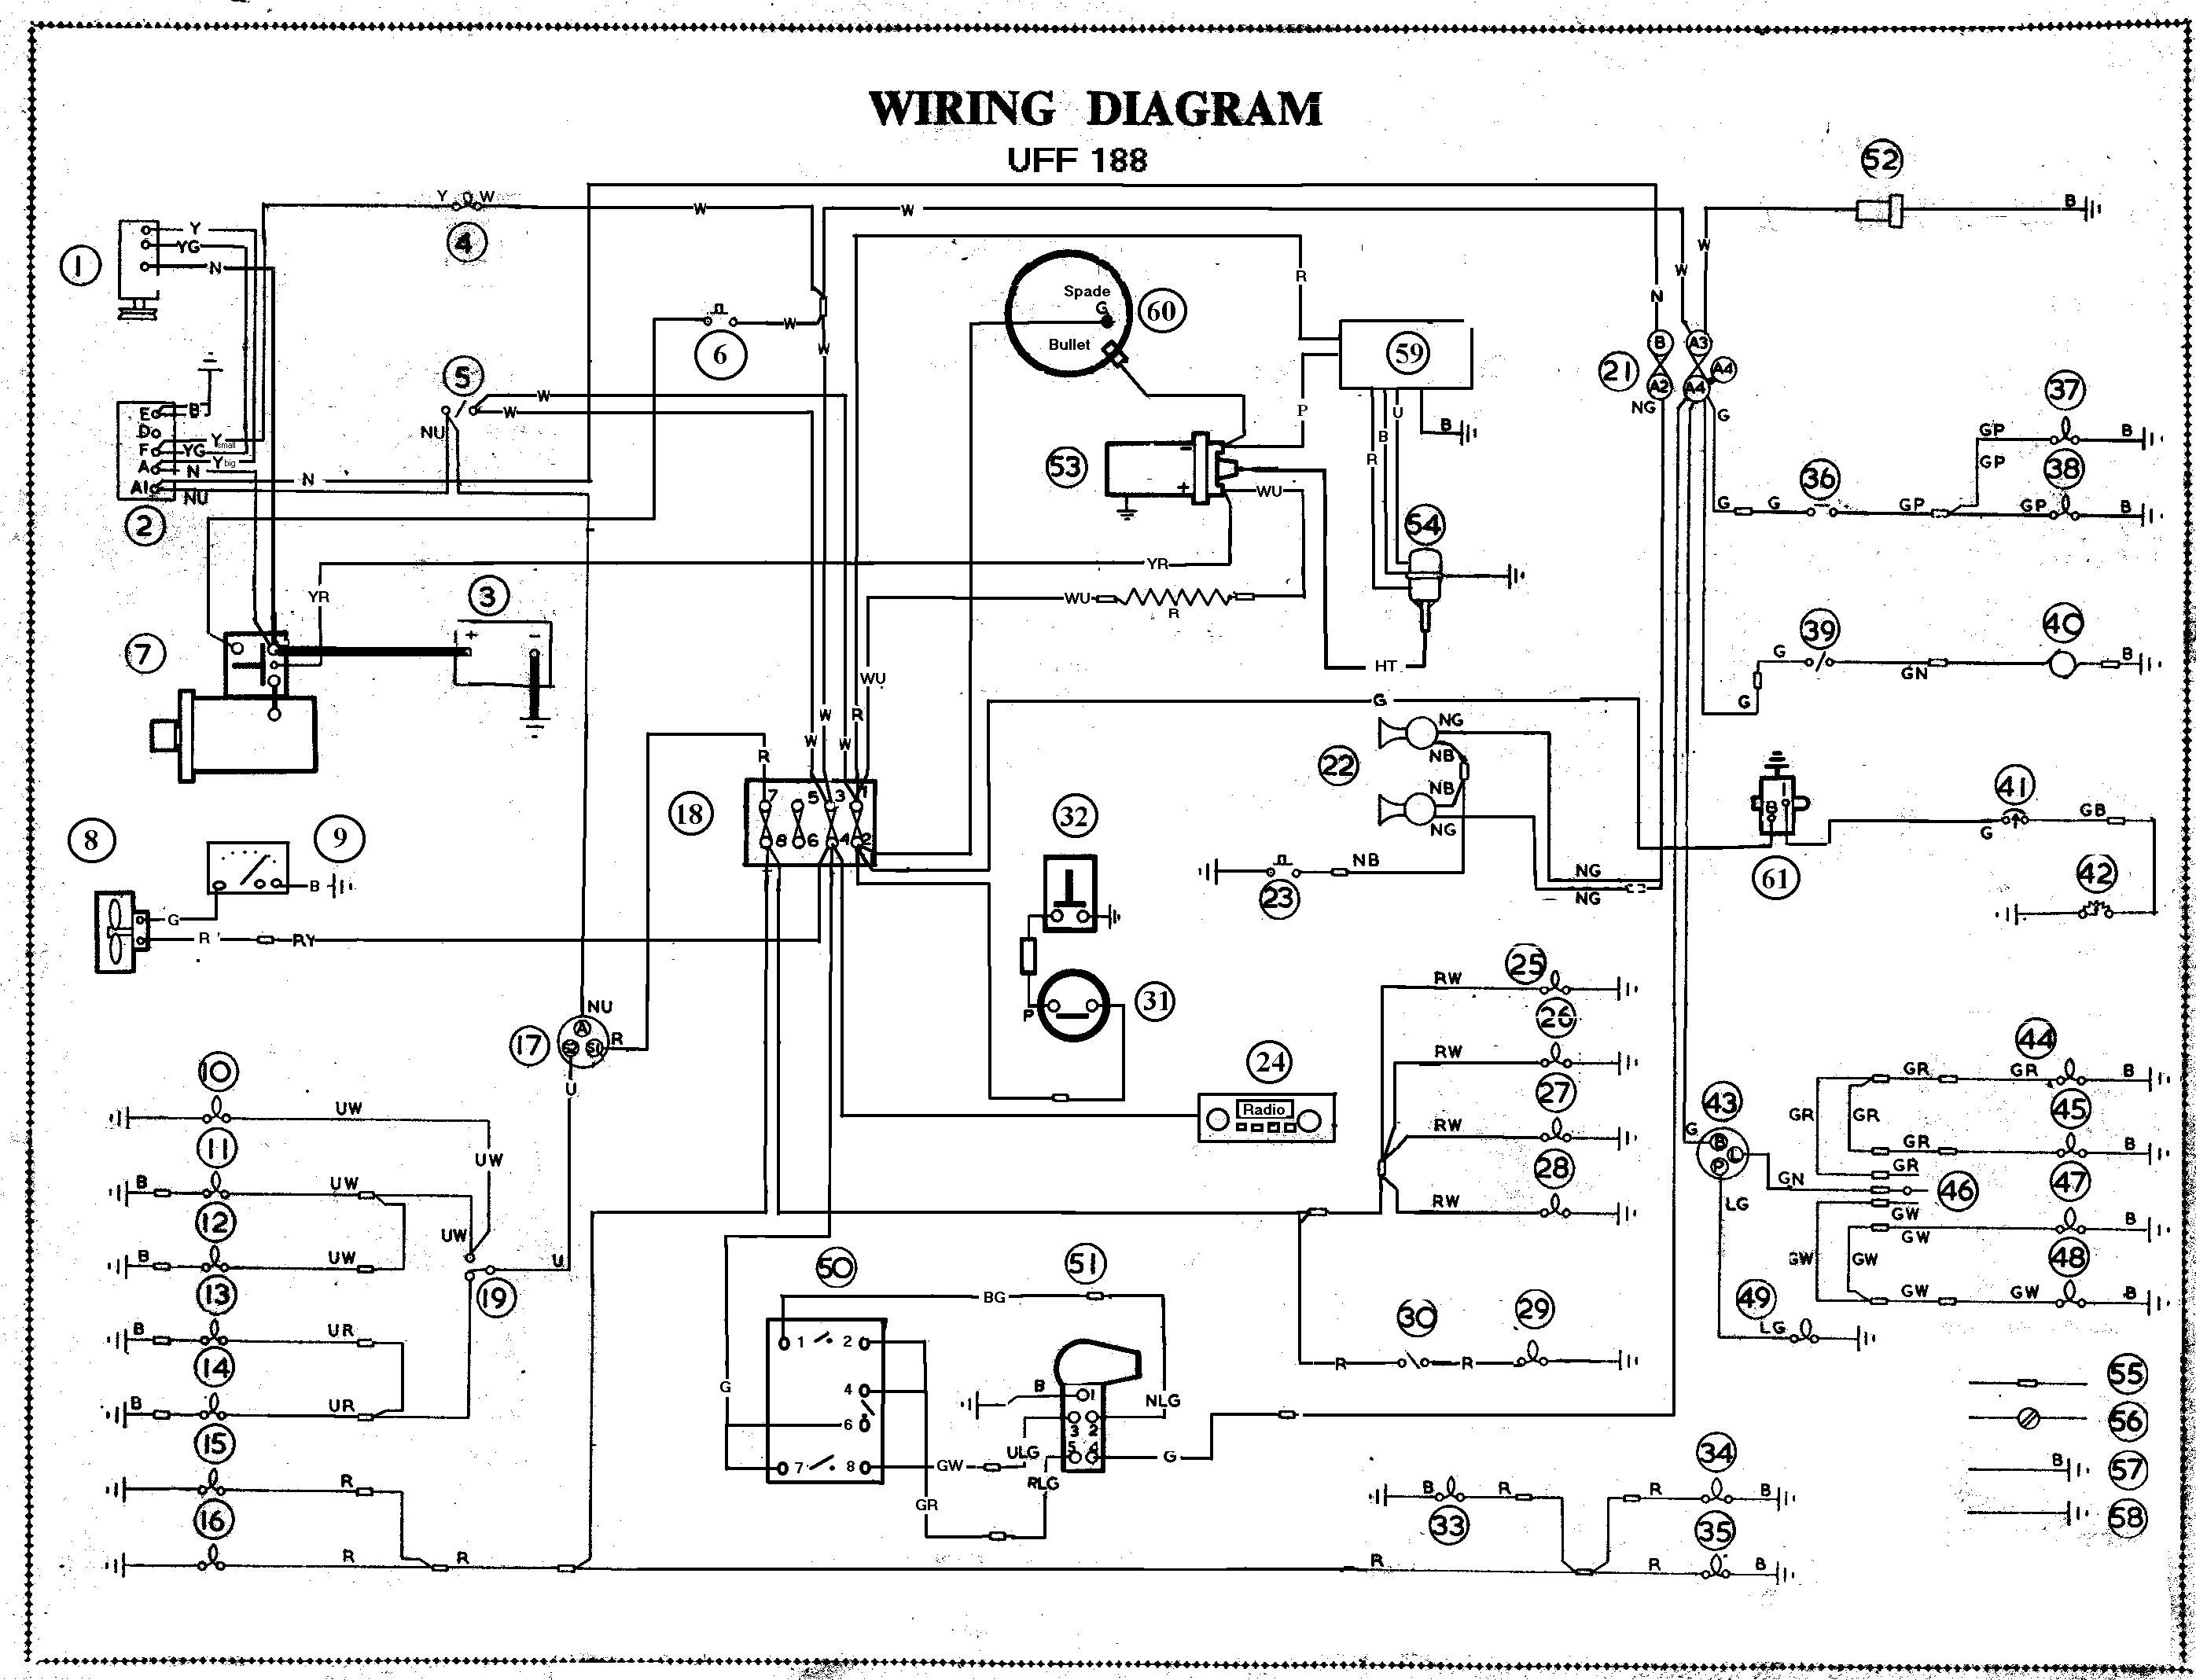 Zivan Diagram Gem Car Wiring - Wiring Diagram Data - Wiring Diagram For